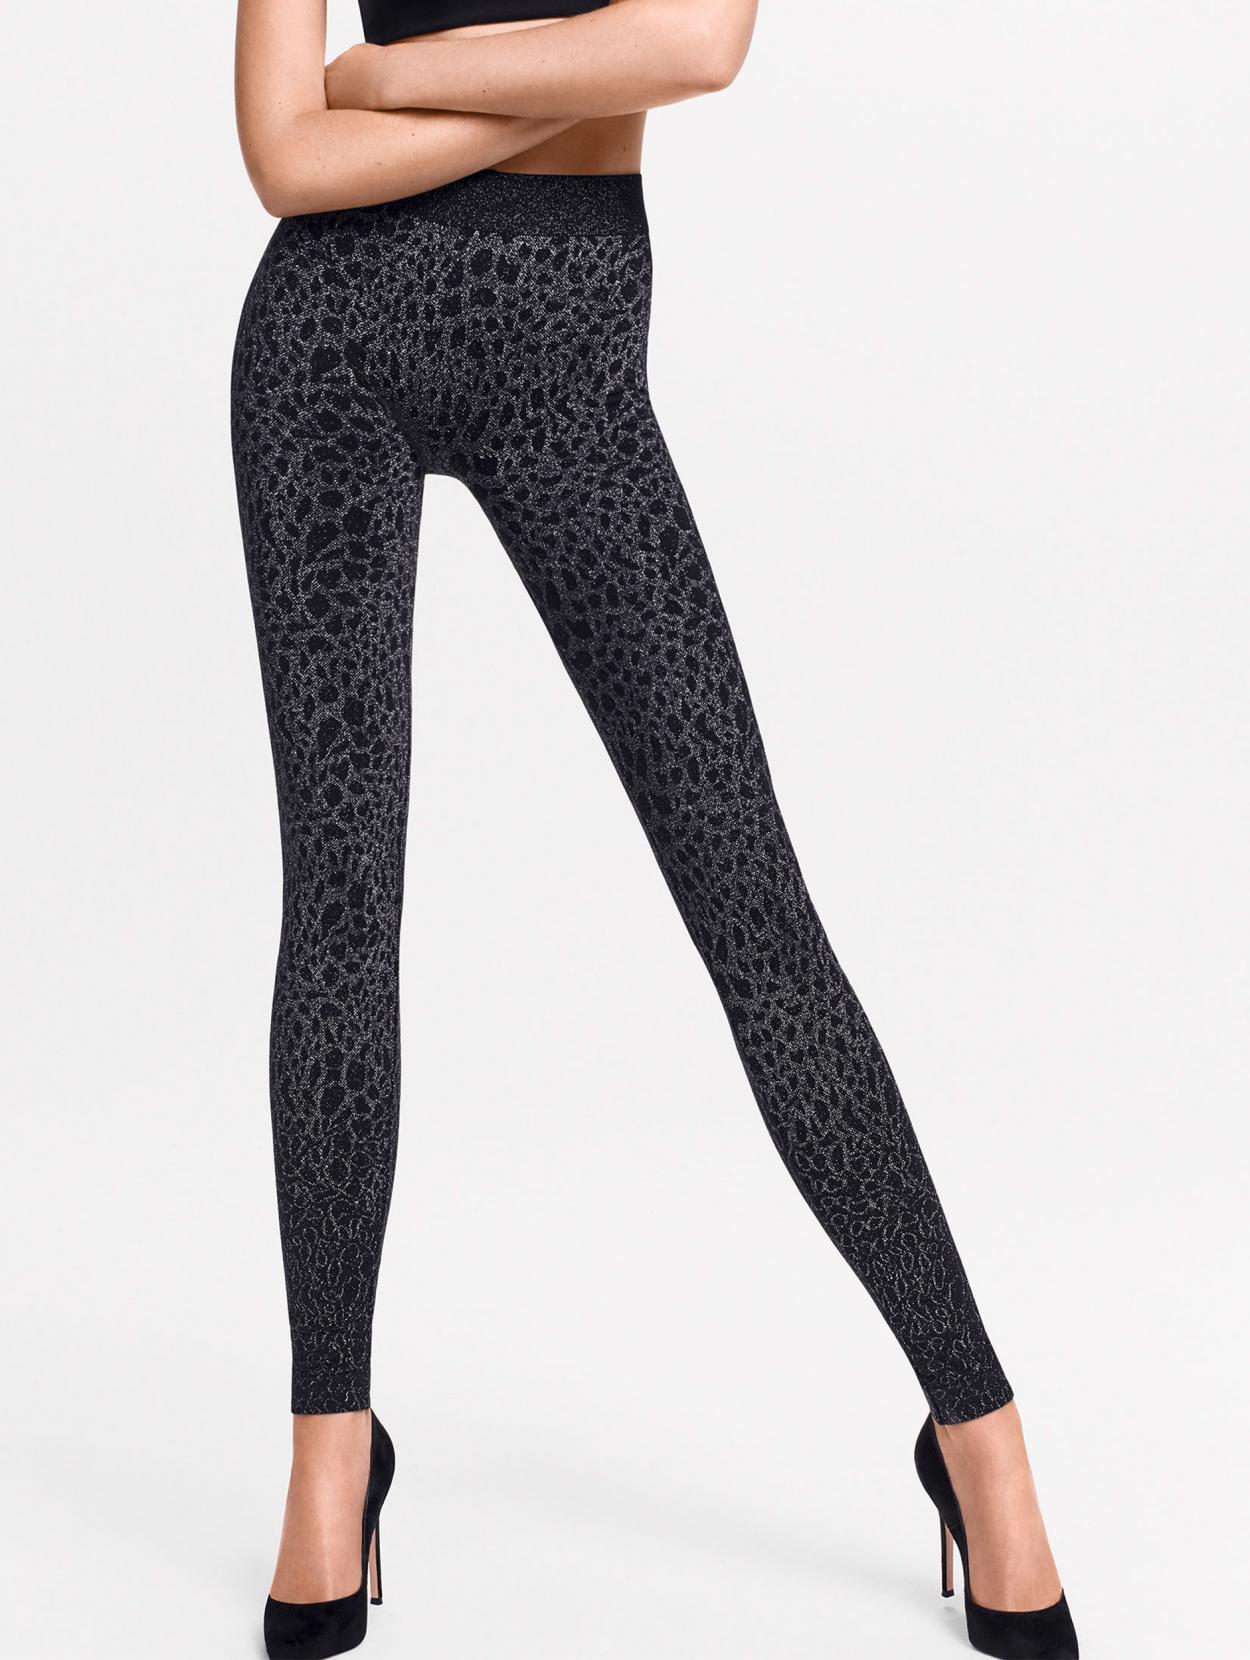 7475945e4 Eleonor Legging - Glitter legging